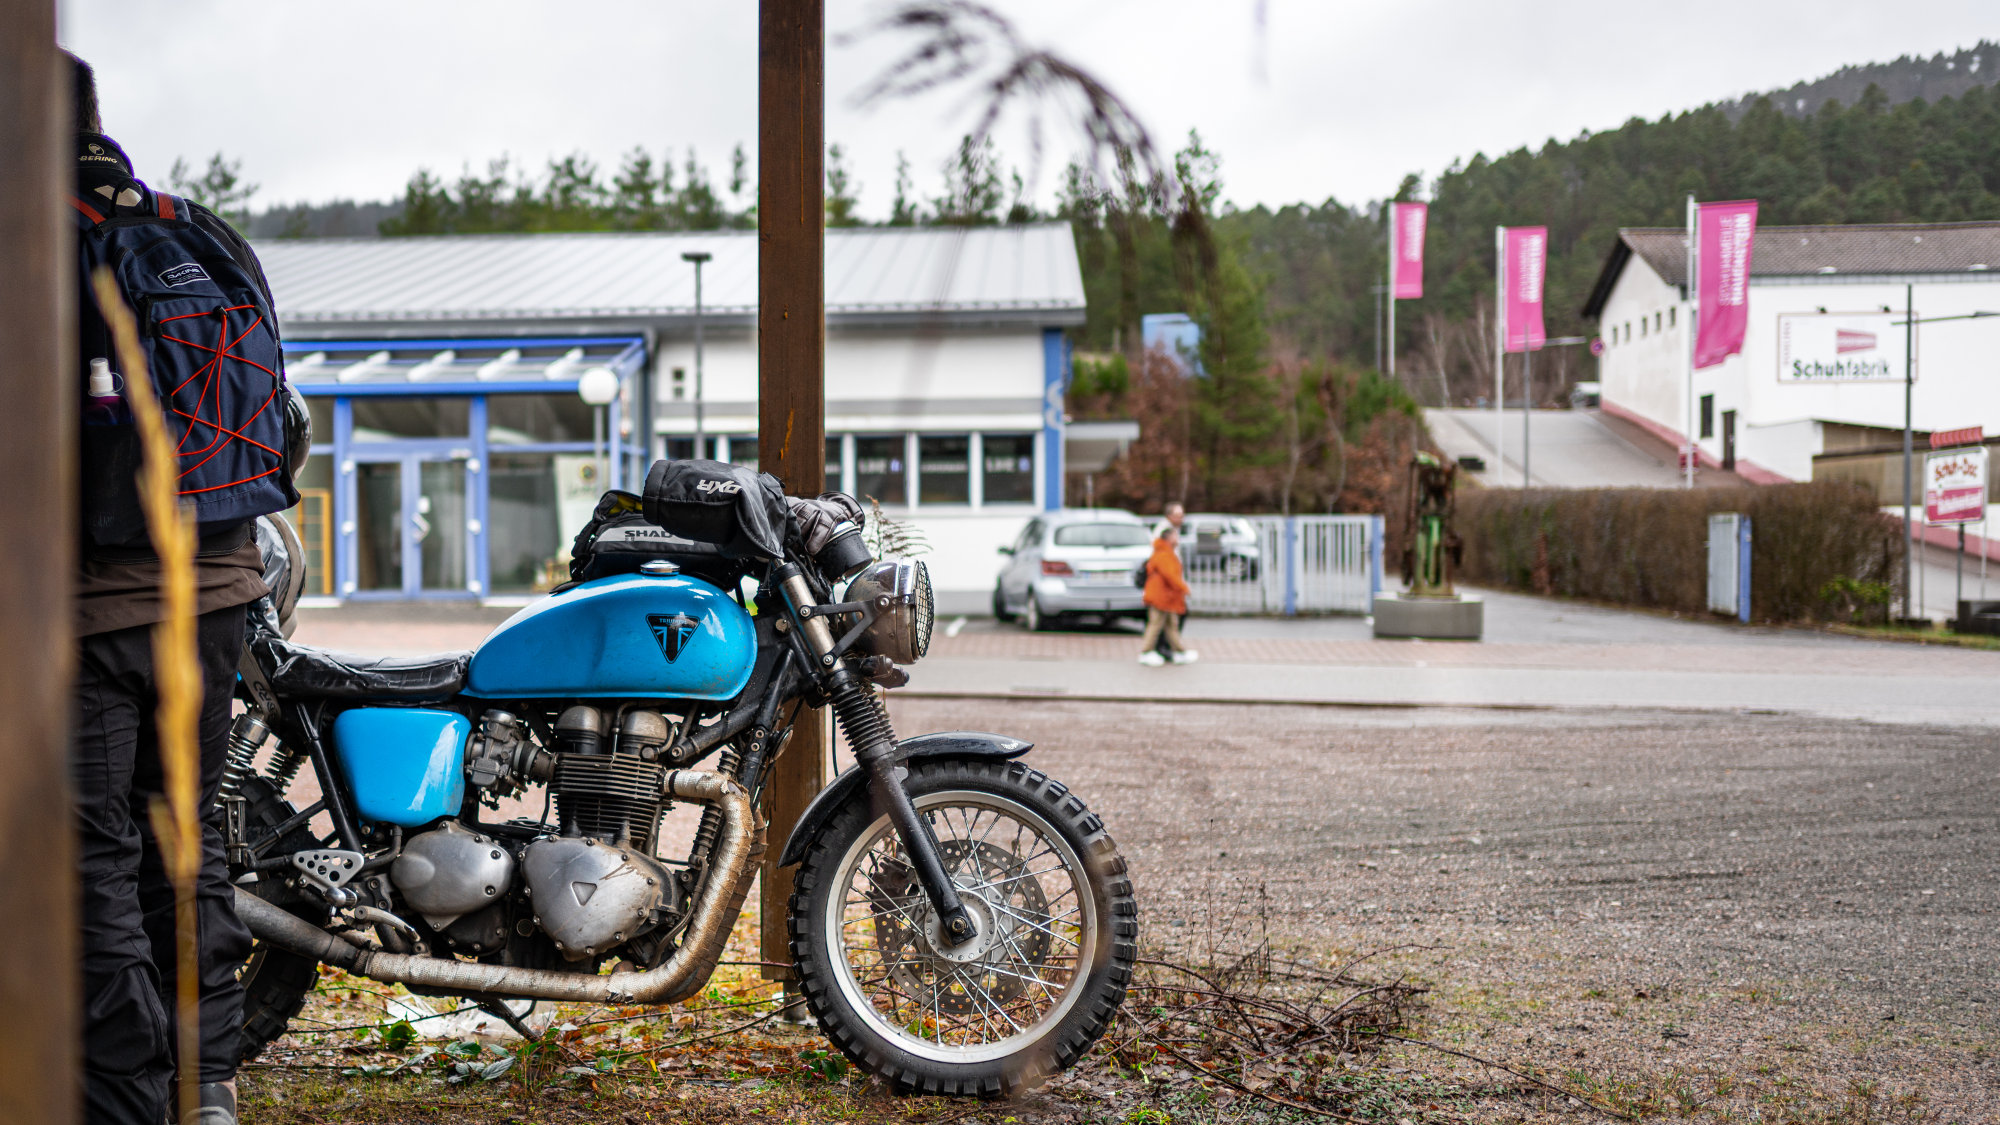 Moto garée